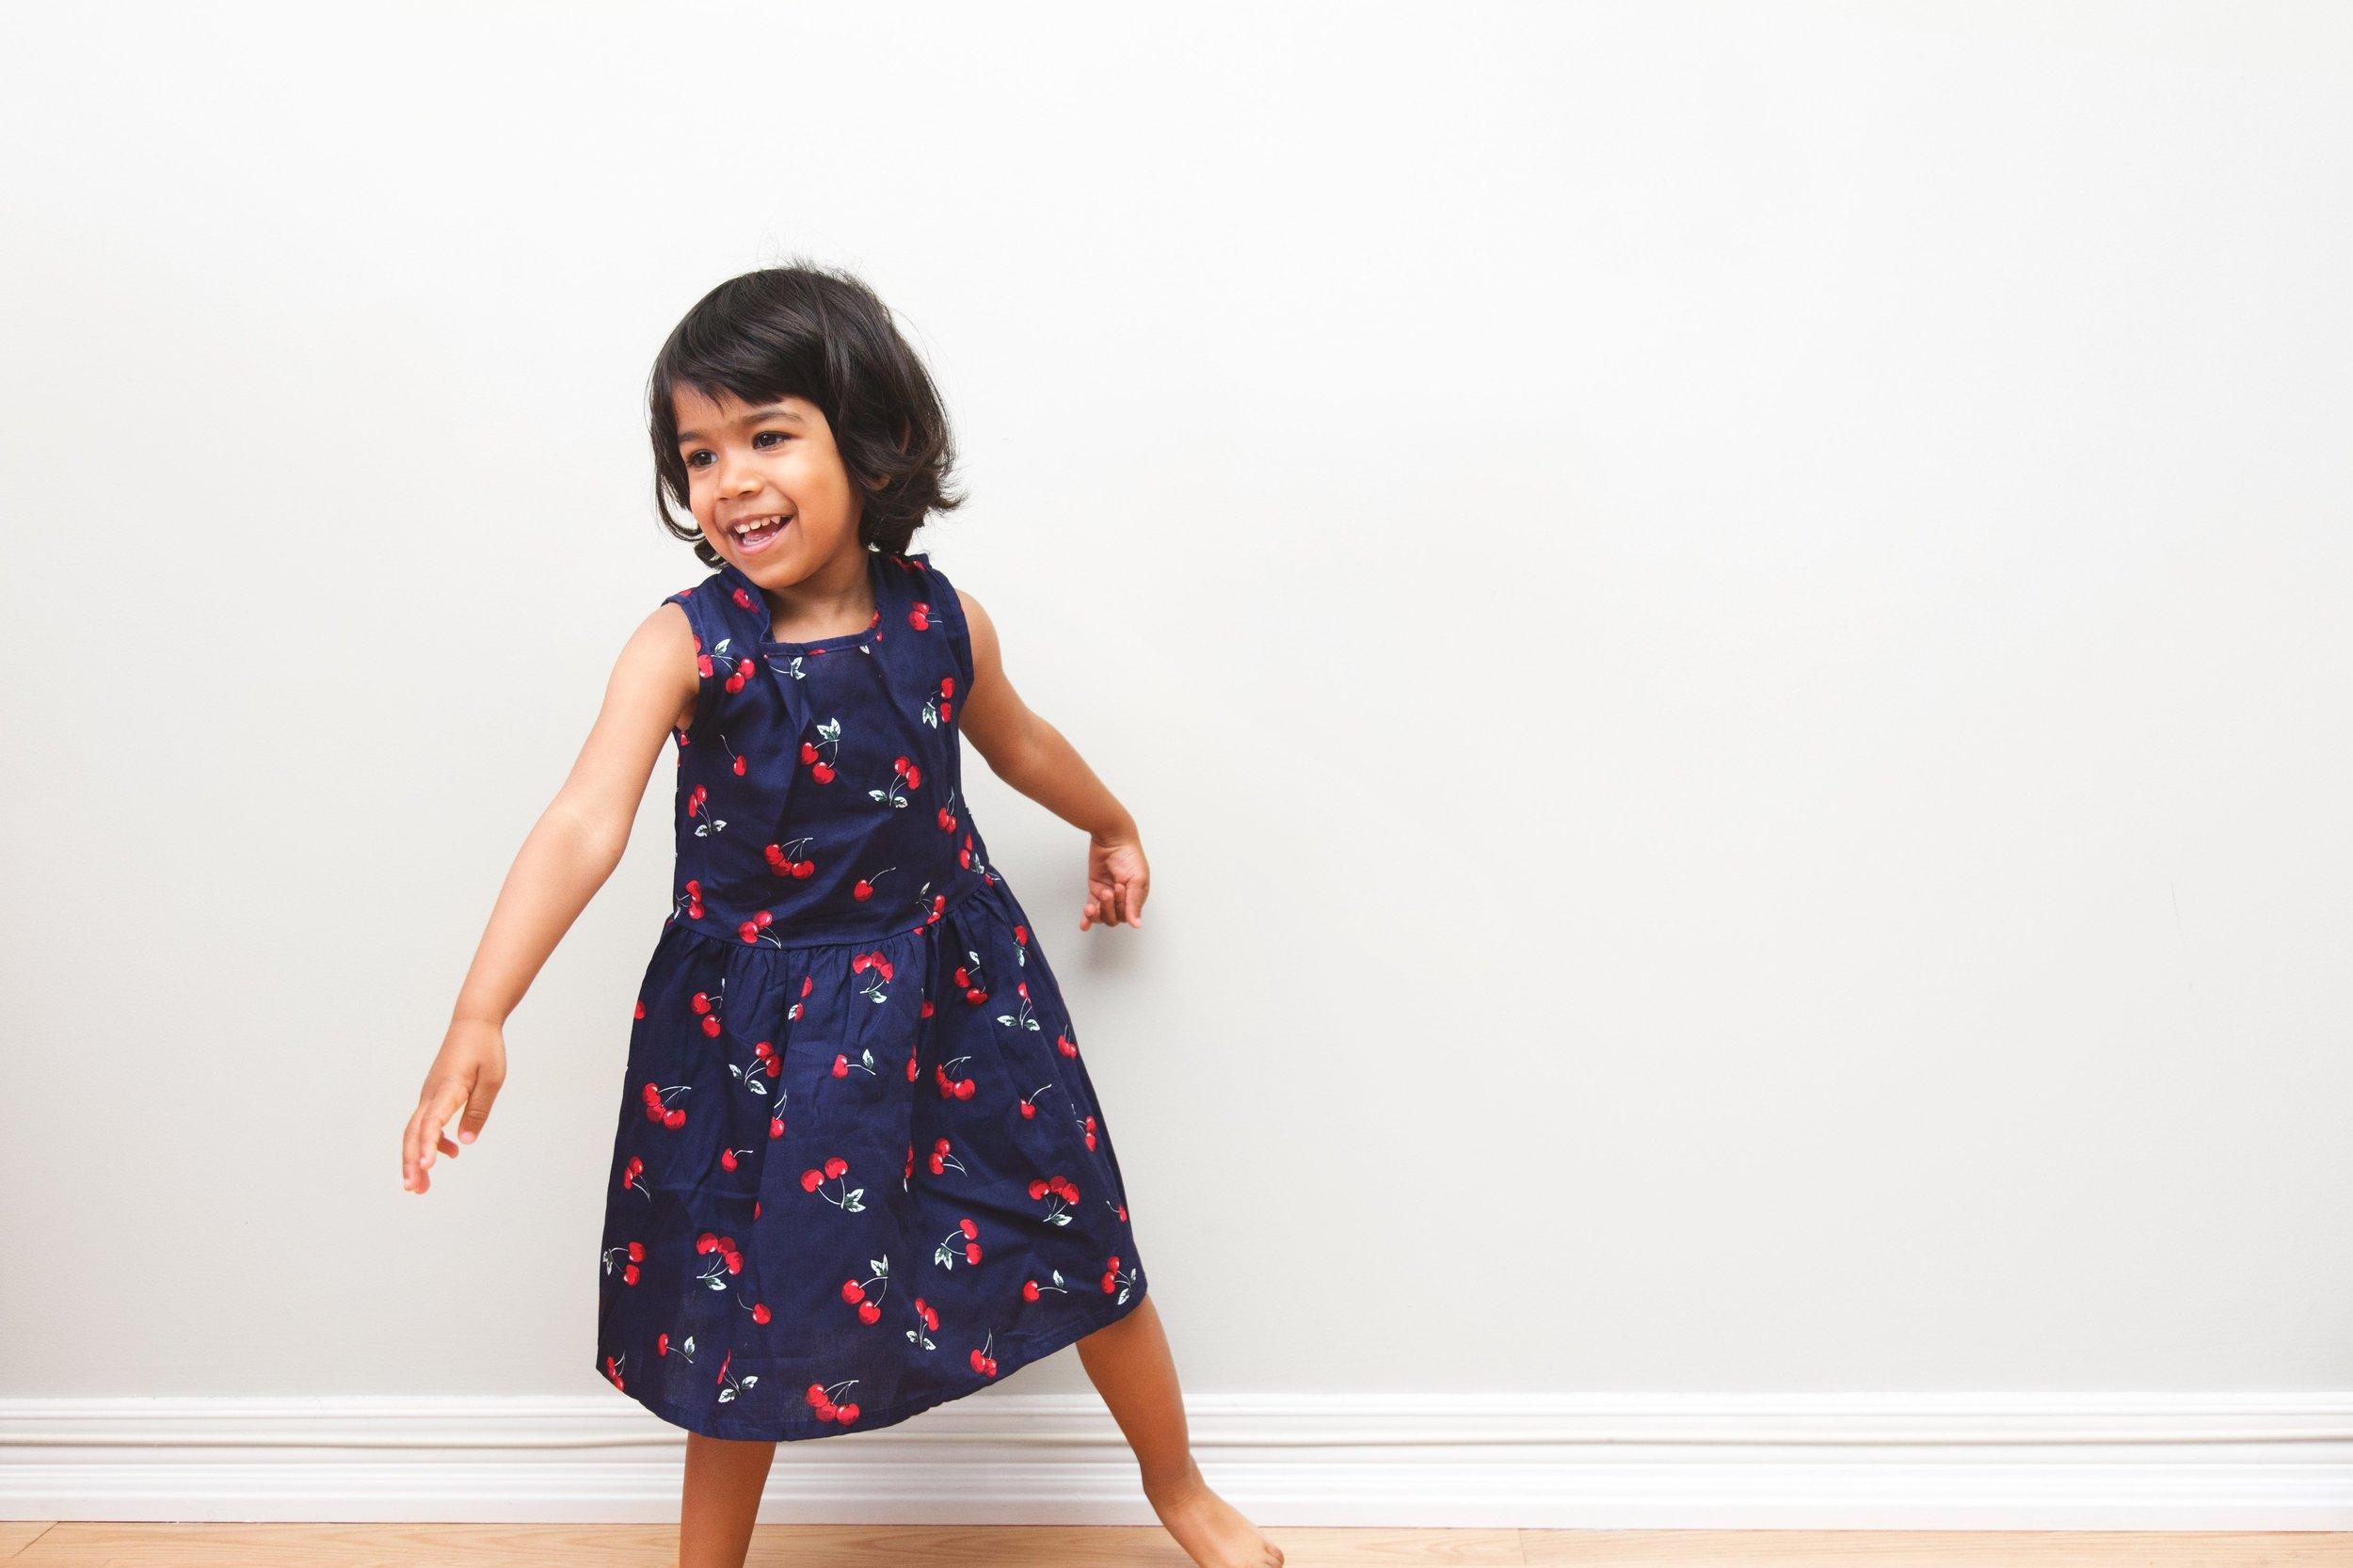 toddler-cherry-dress_4460x4460.jpg